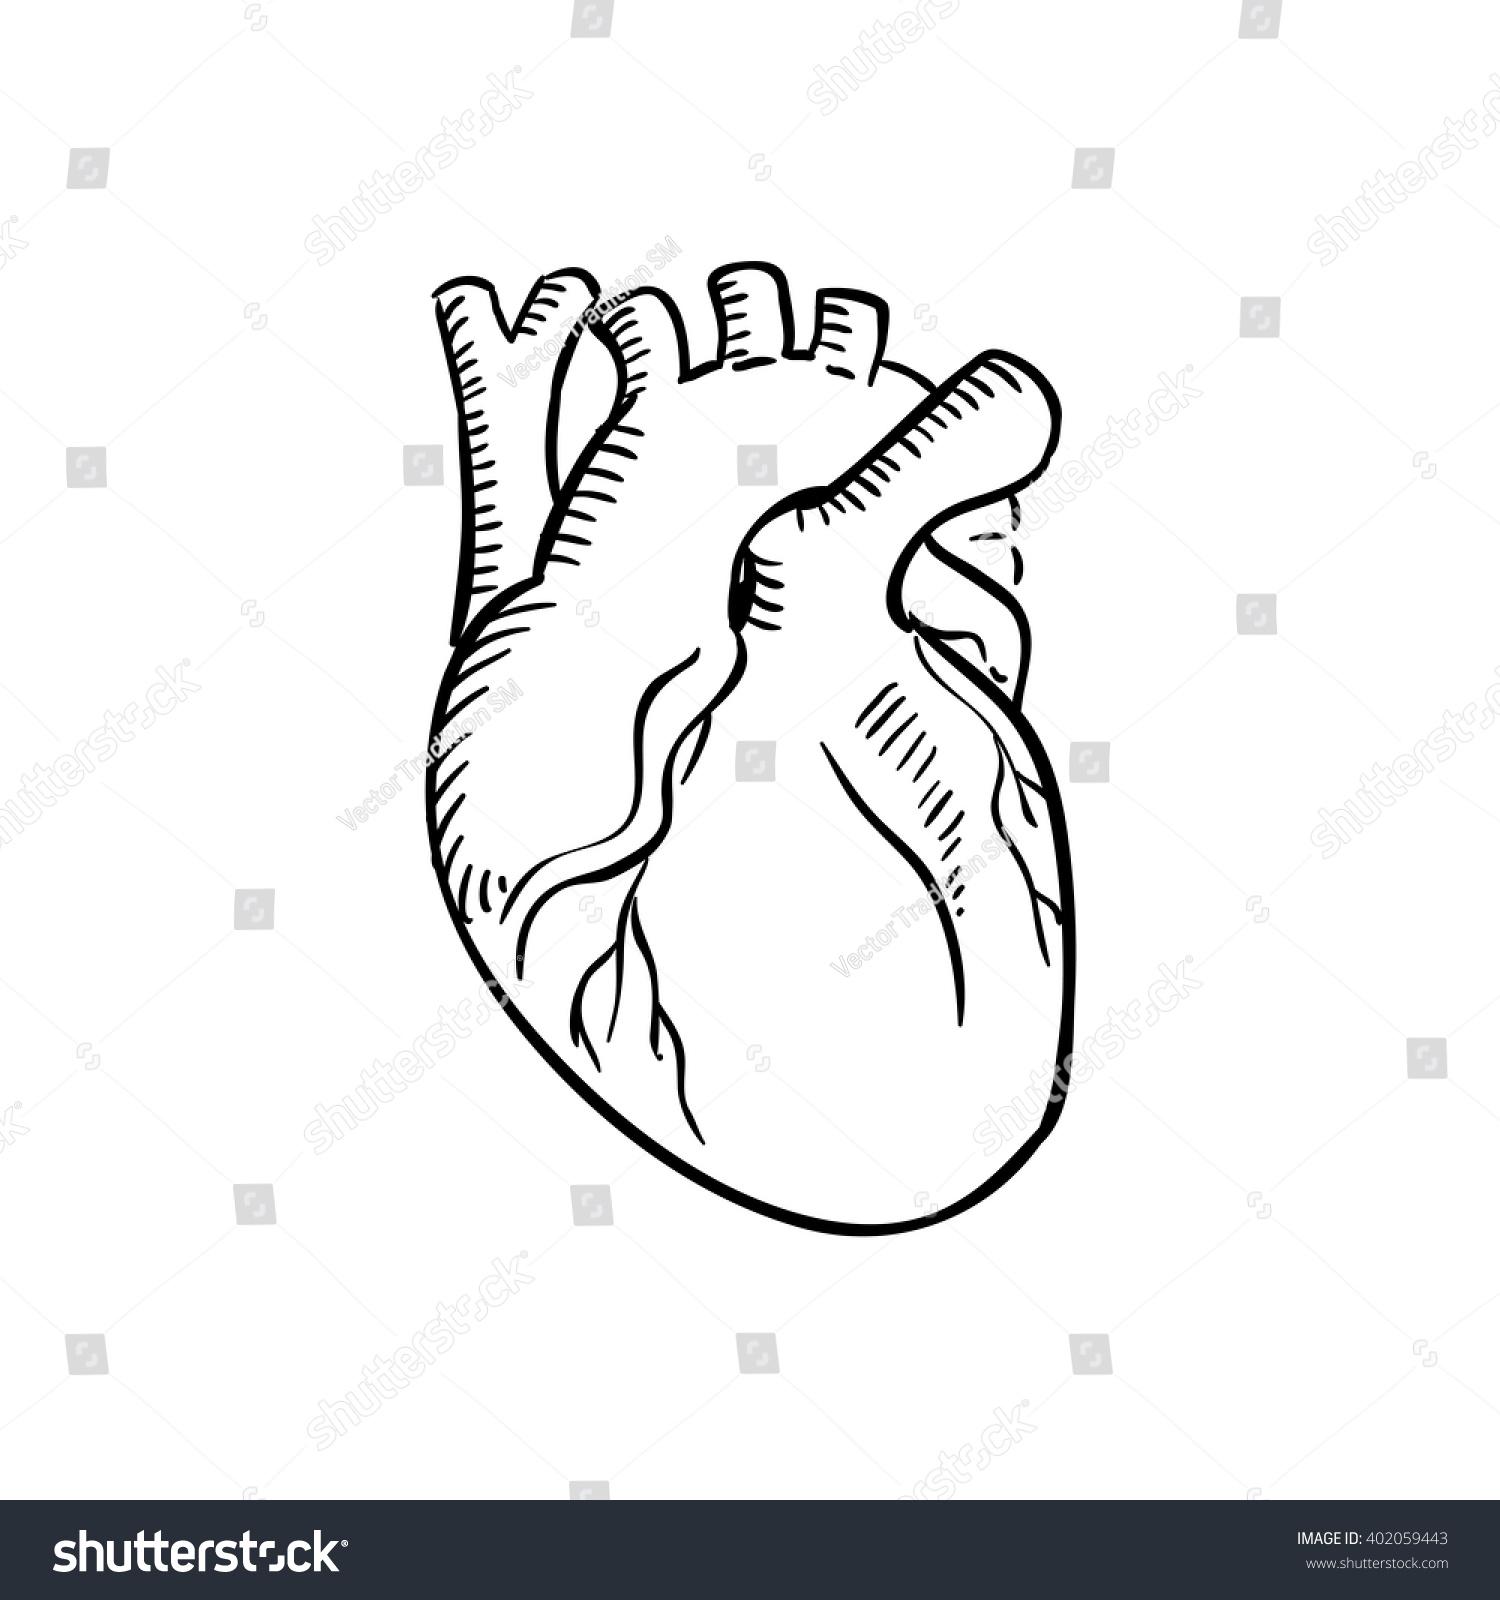 Human Heart Outline Sketch Isolated Anatomical Stock Vektorgrafik